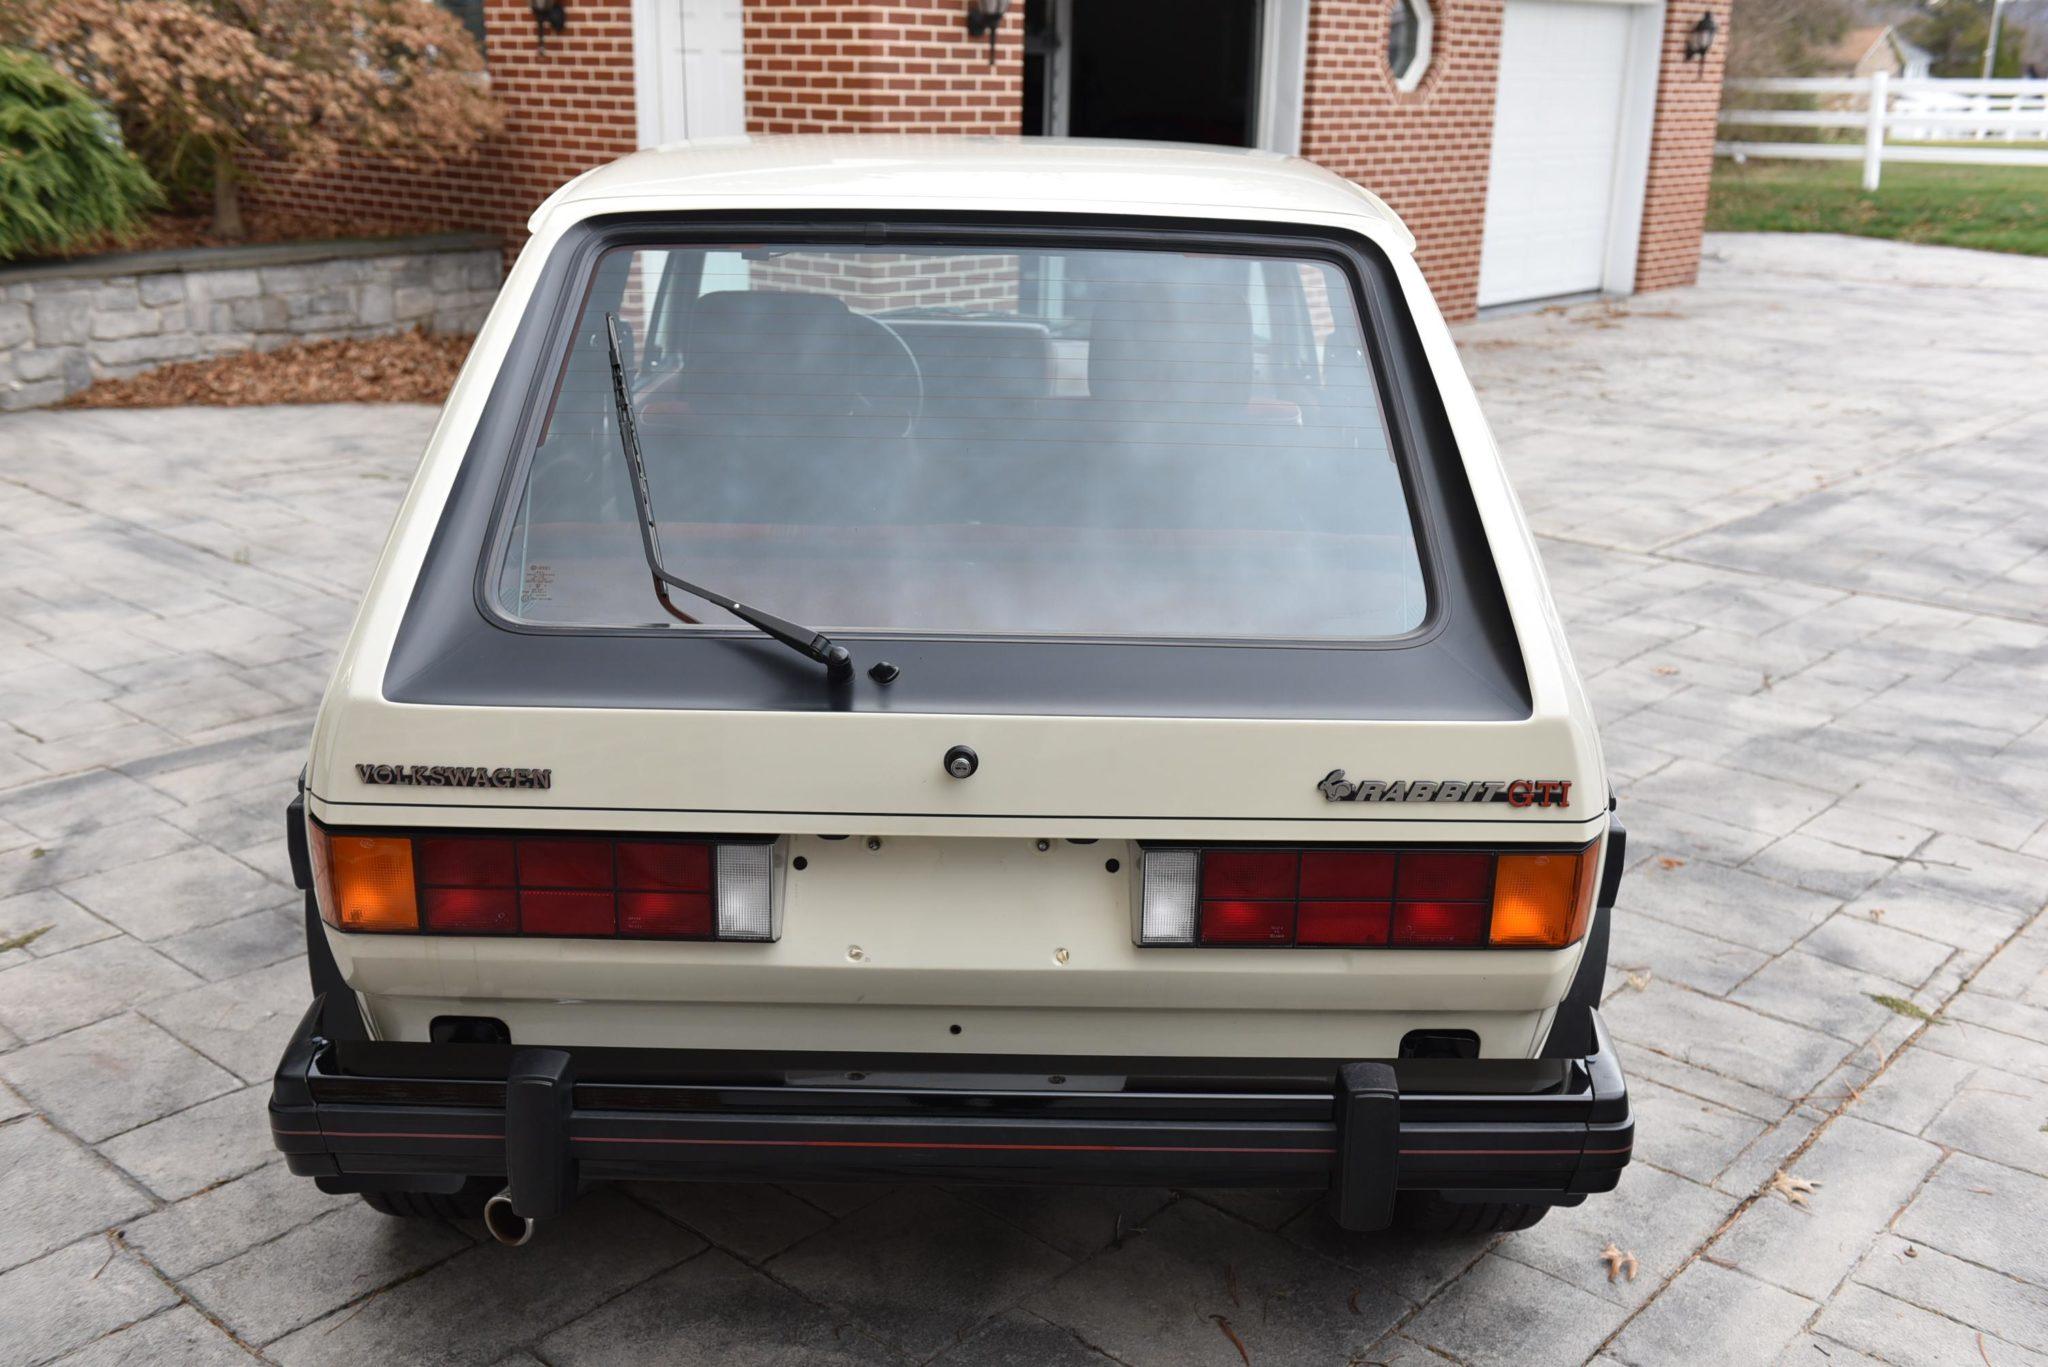 1983_volkswagen_rabbit_gti_1587038935cbc114e7b9c27f8dLEM_9899-scaled